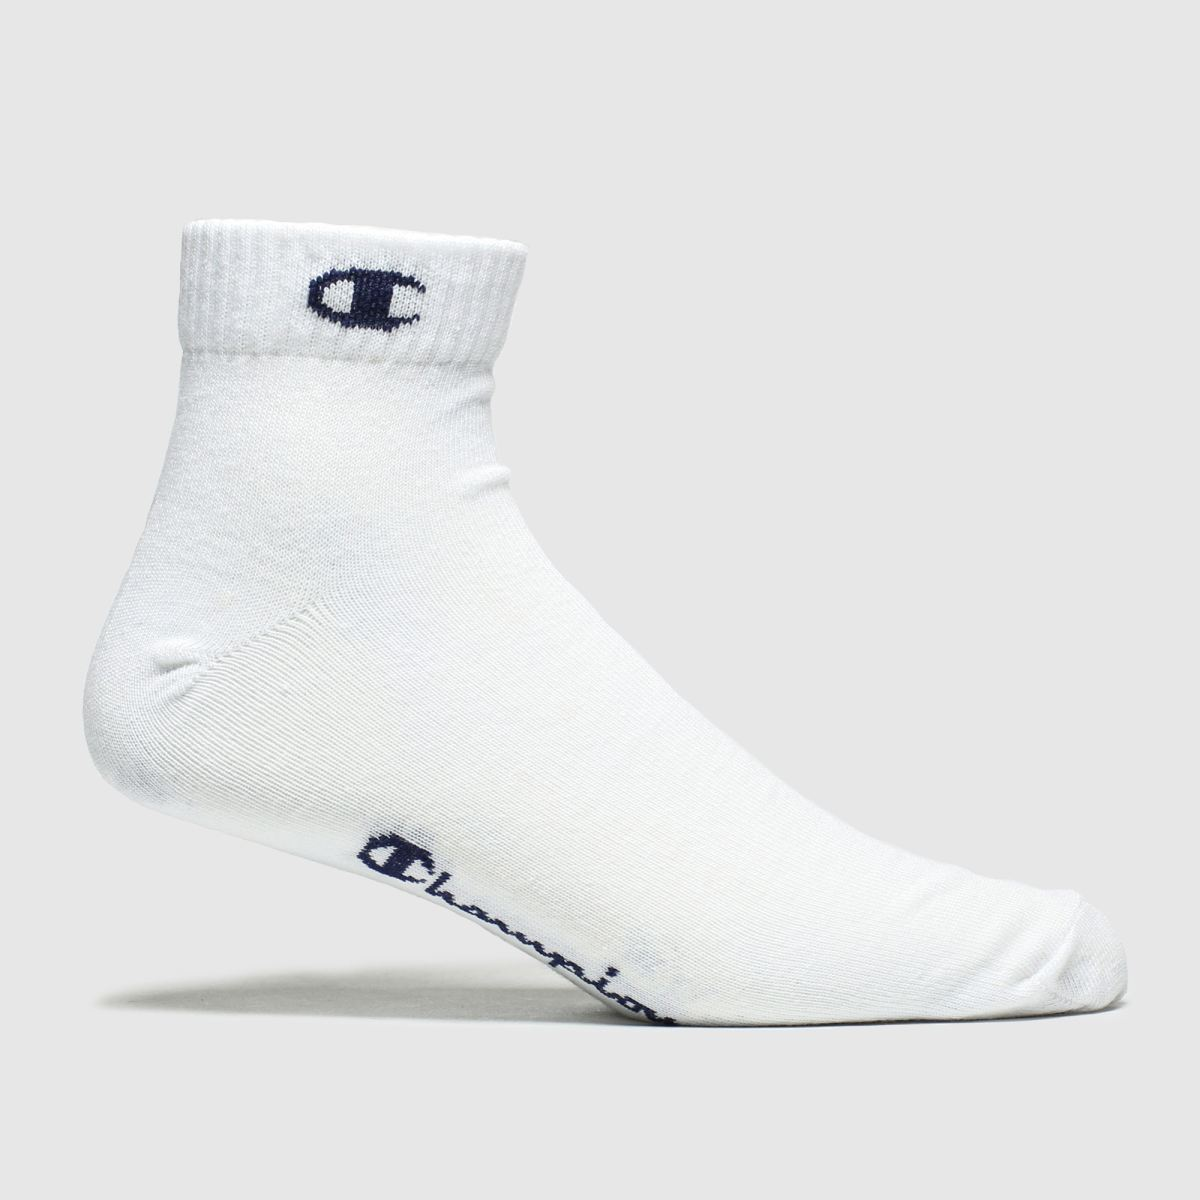 Champion Accessories Champion White Ankle 3pk